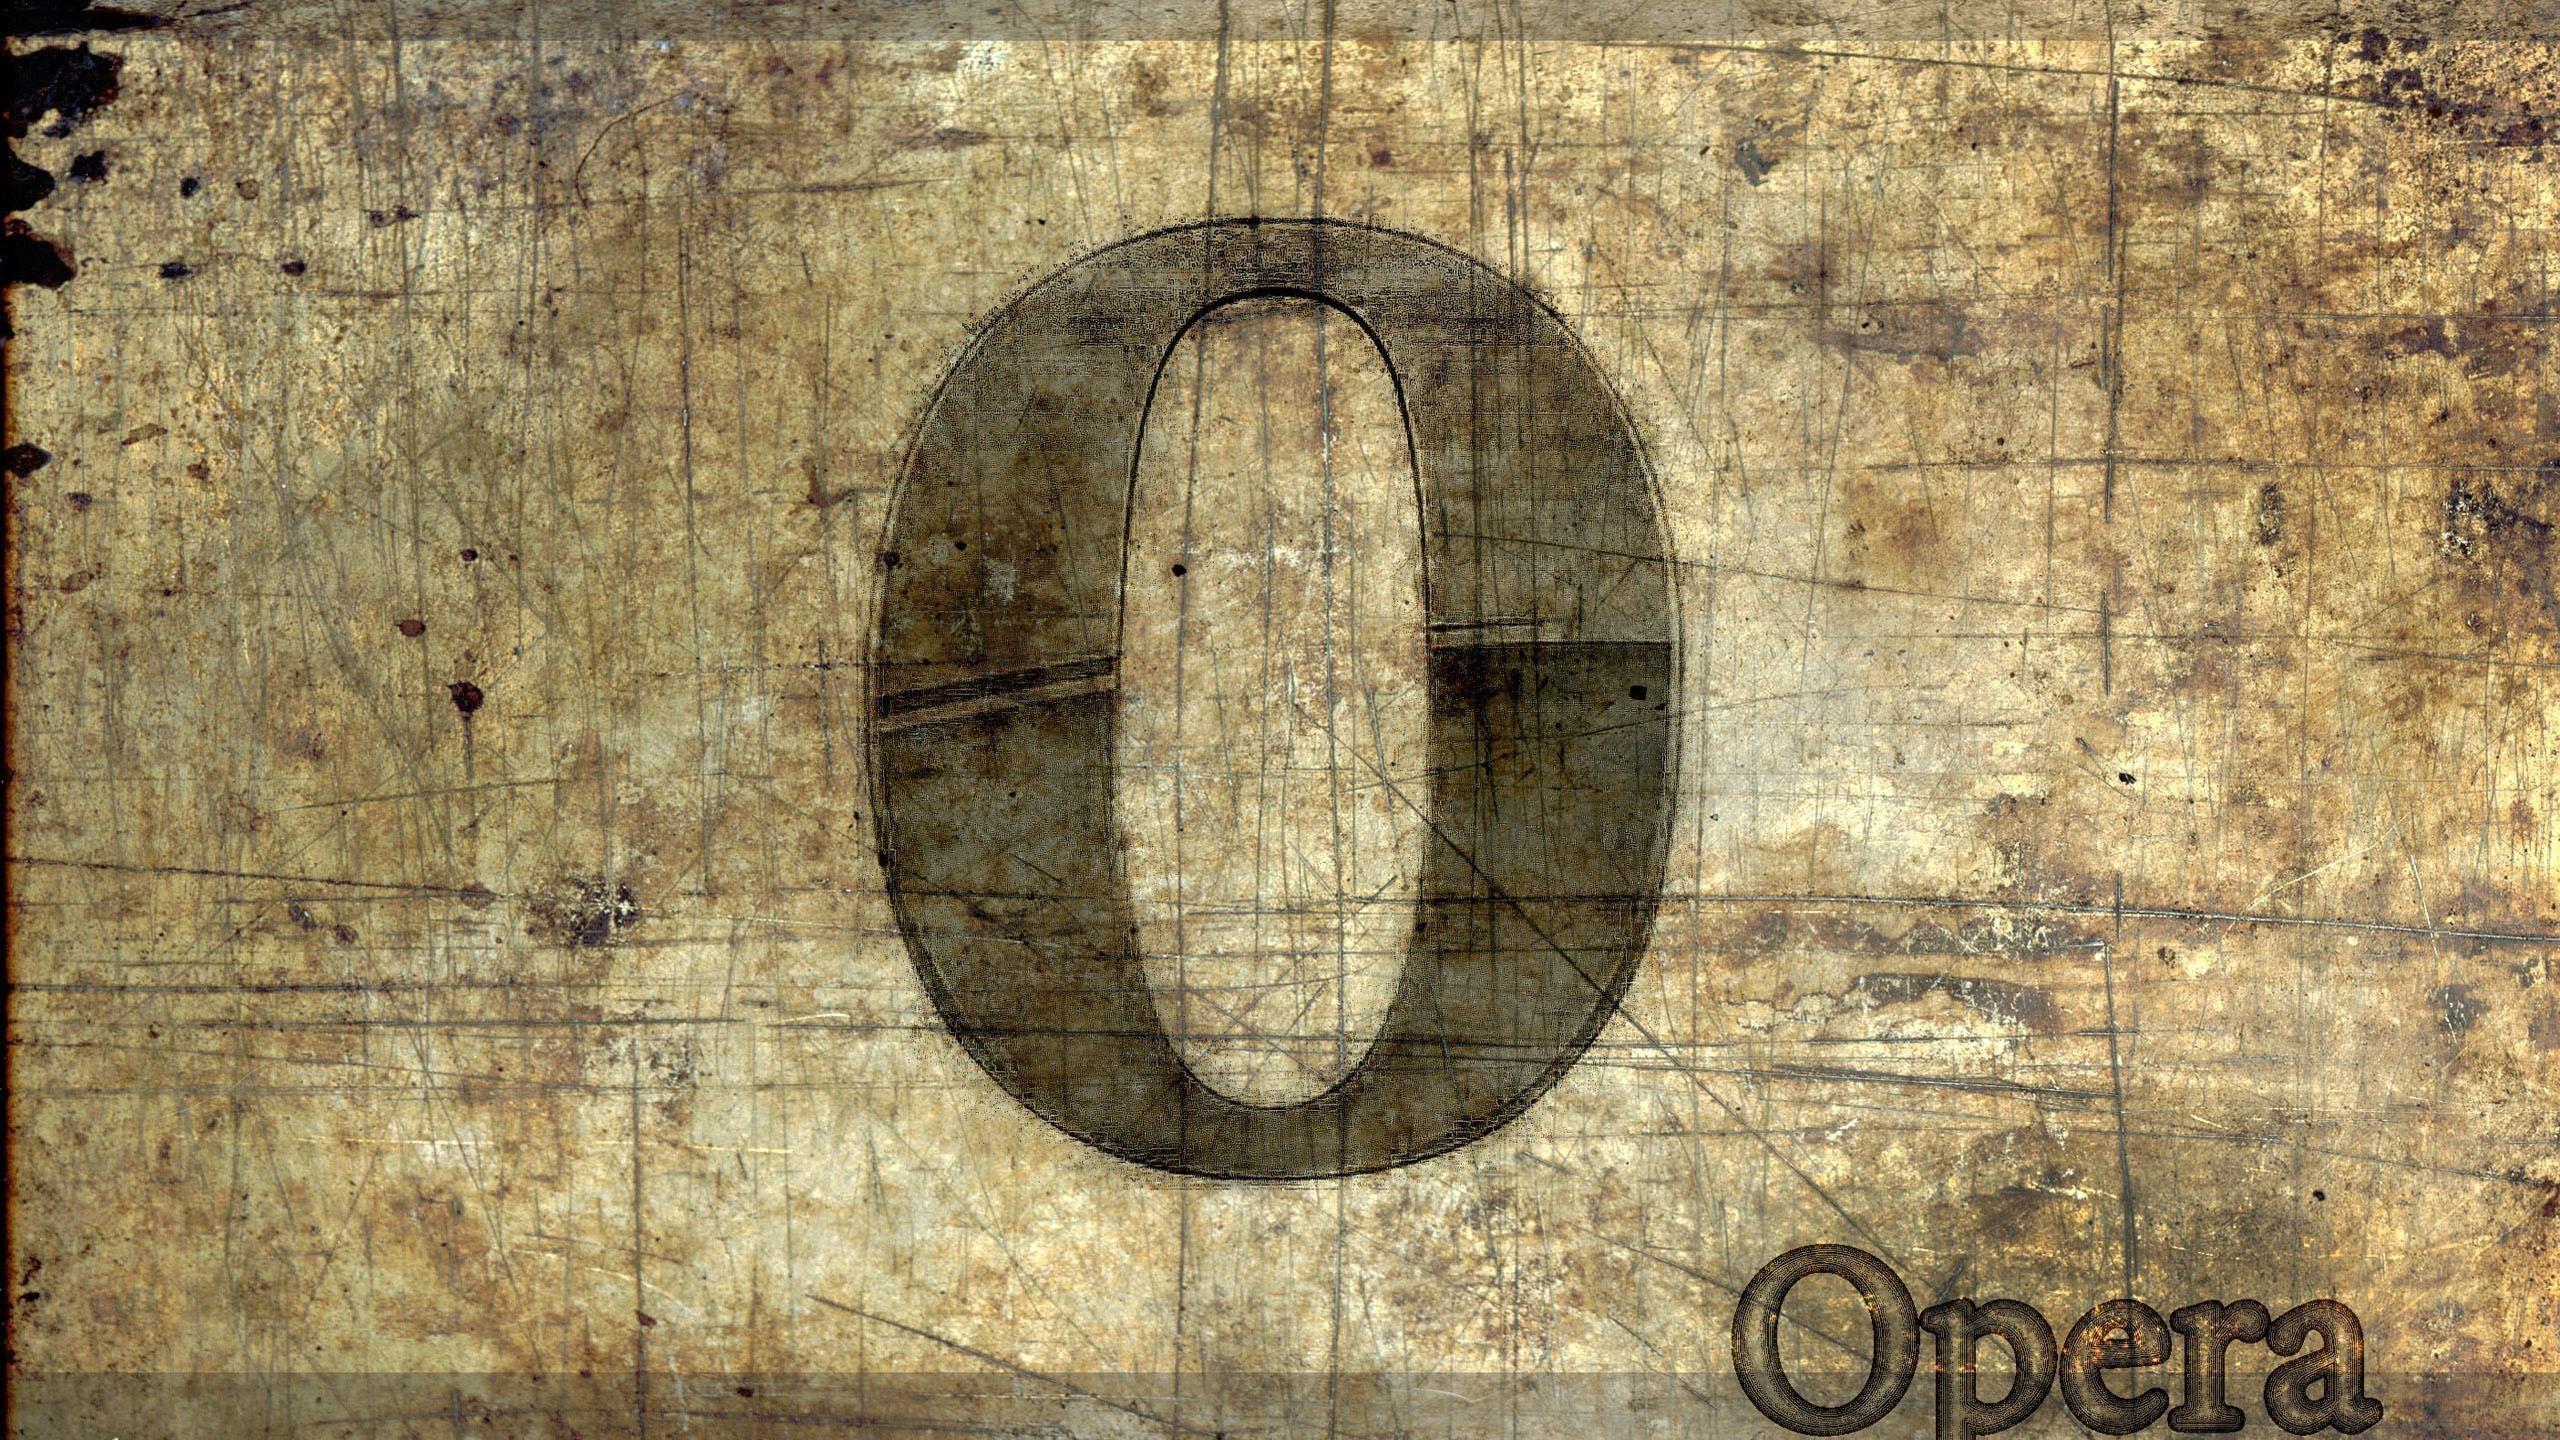 opera_wallpaper